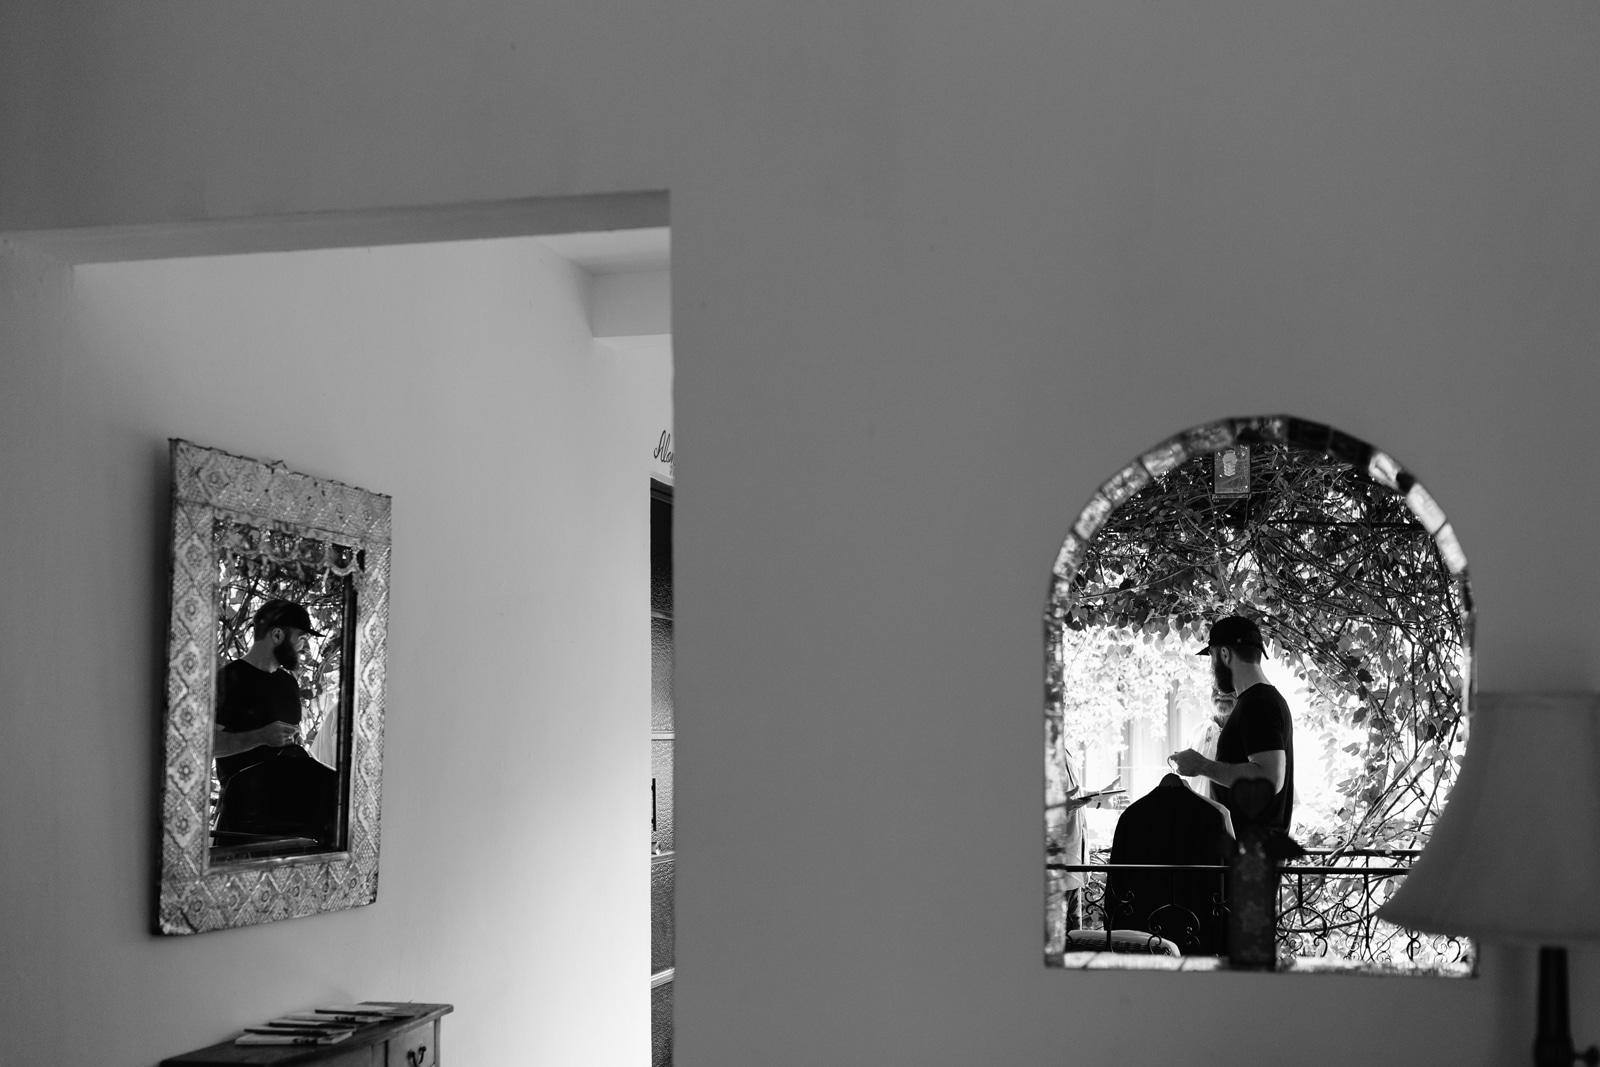 034-intimate-portraits